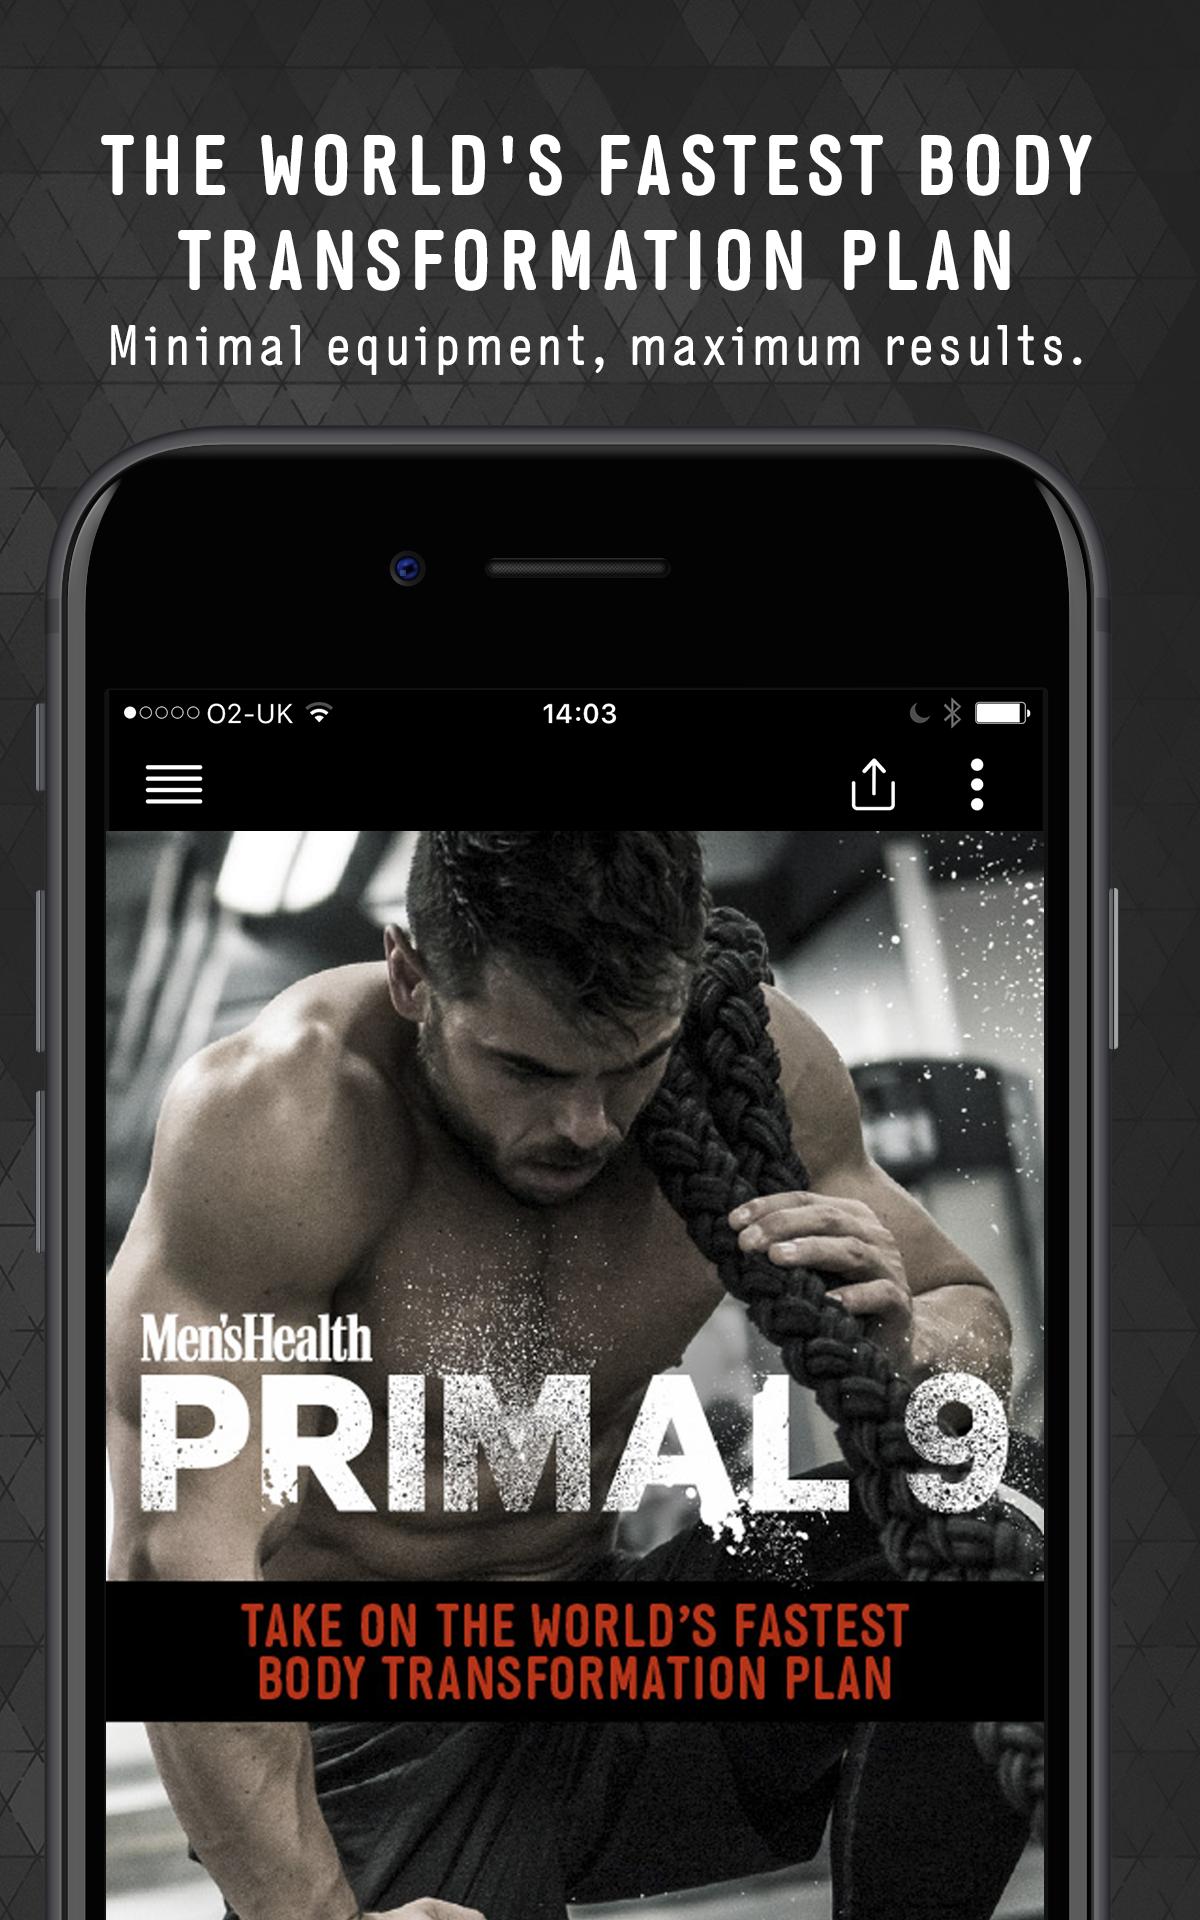 Primal 9, The World's Fastest Transformation Programme, Has Landed Primal 9, The World's Fastest Transformation Programme, Has Landed new foto